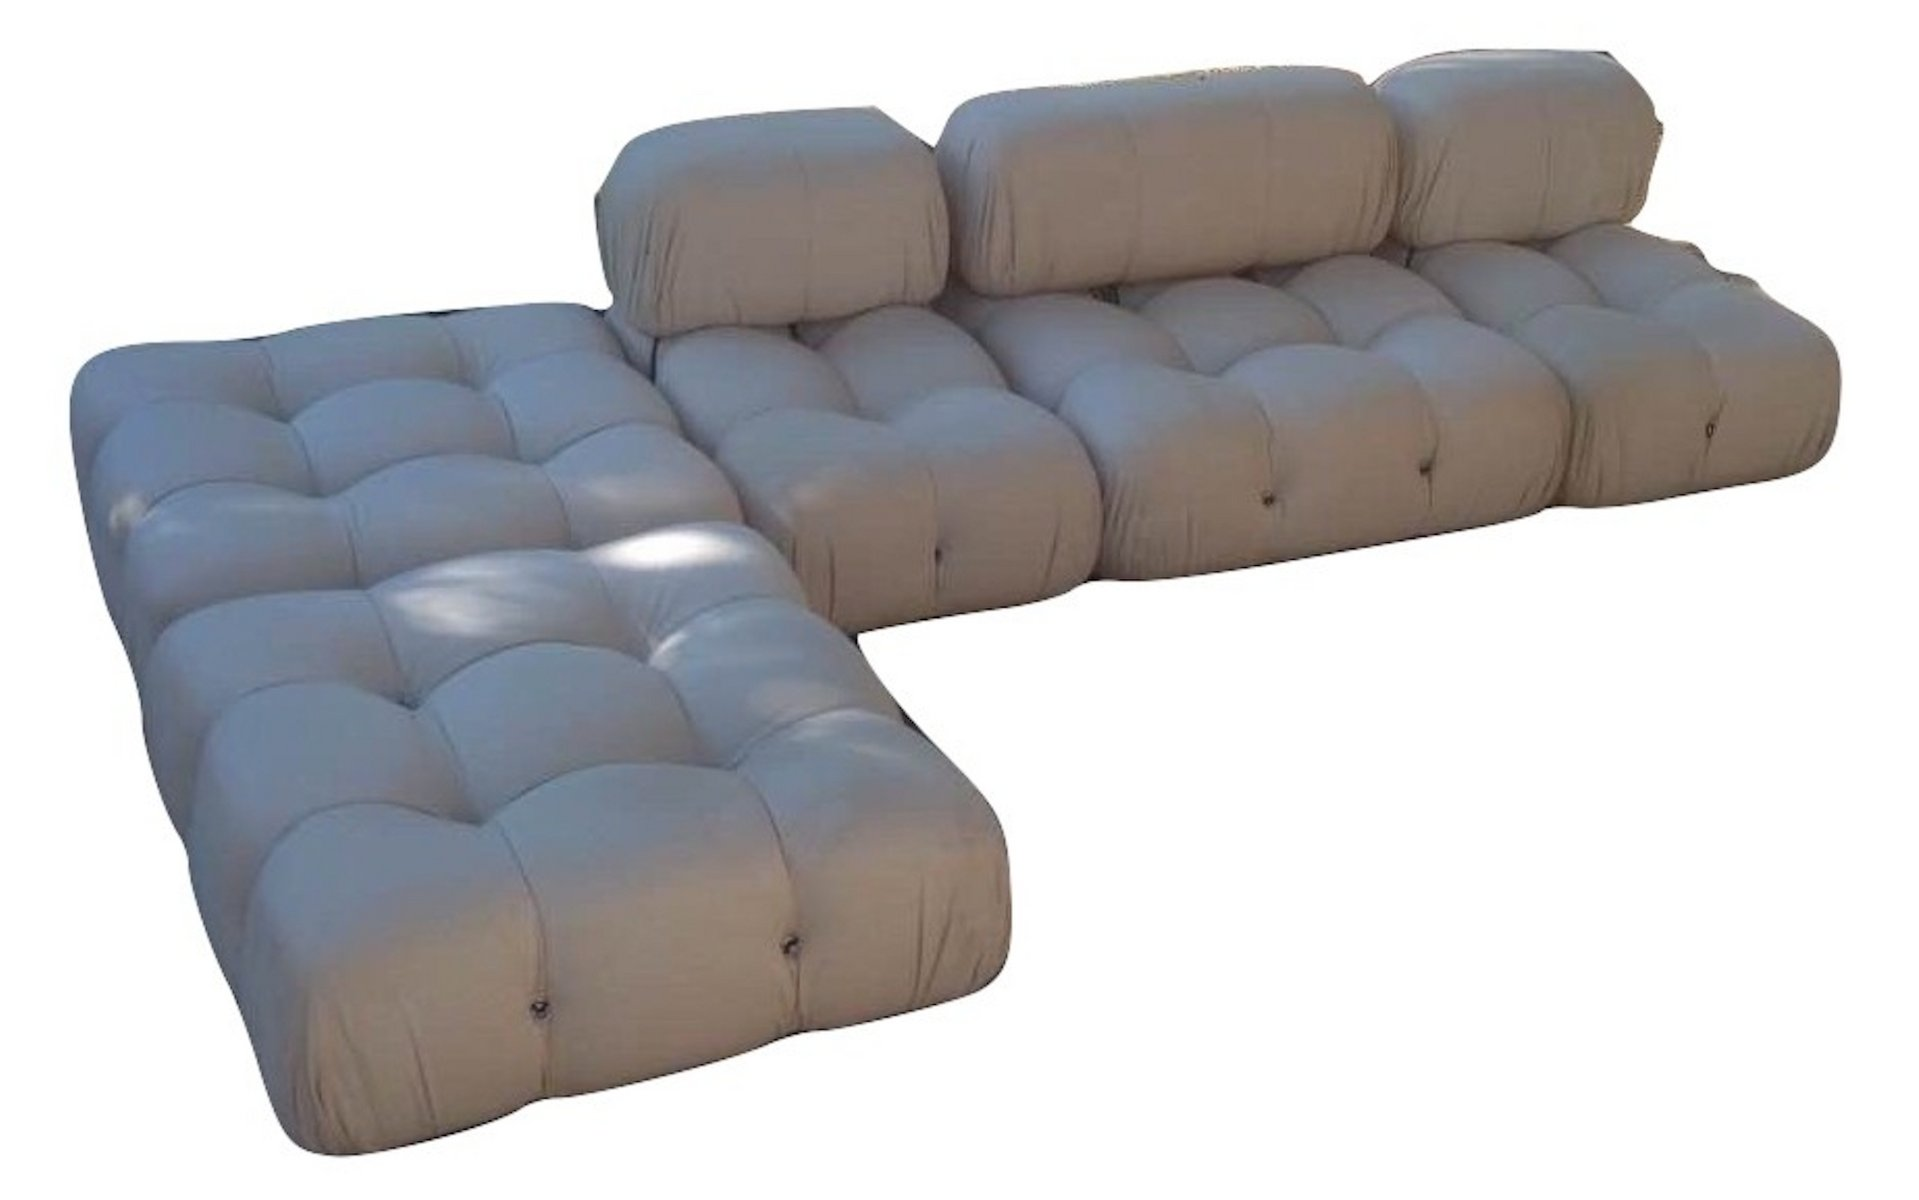 Vintage Camaleonda Modular Lounge Sofa By Mario Bellini For C B Italia 1973